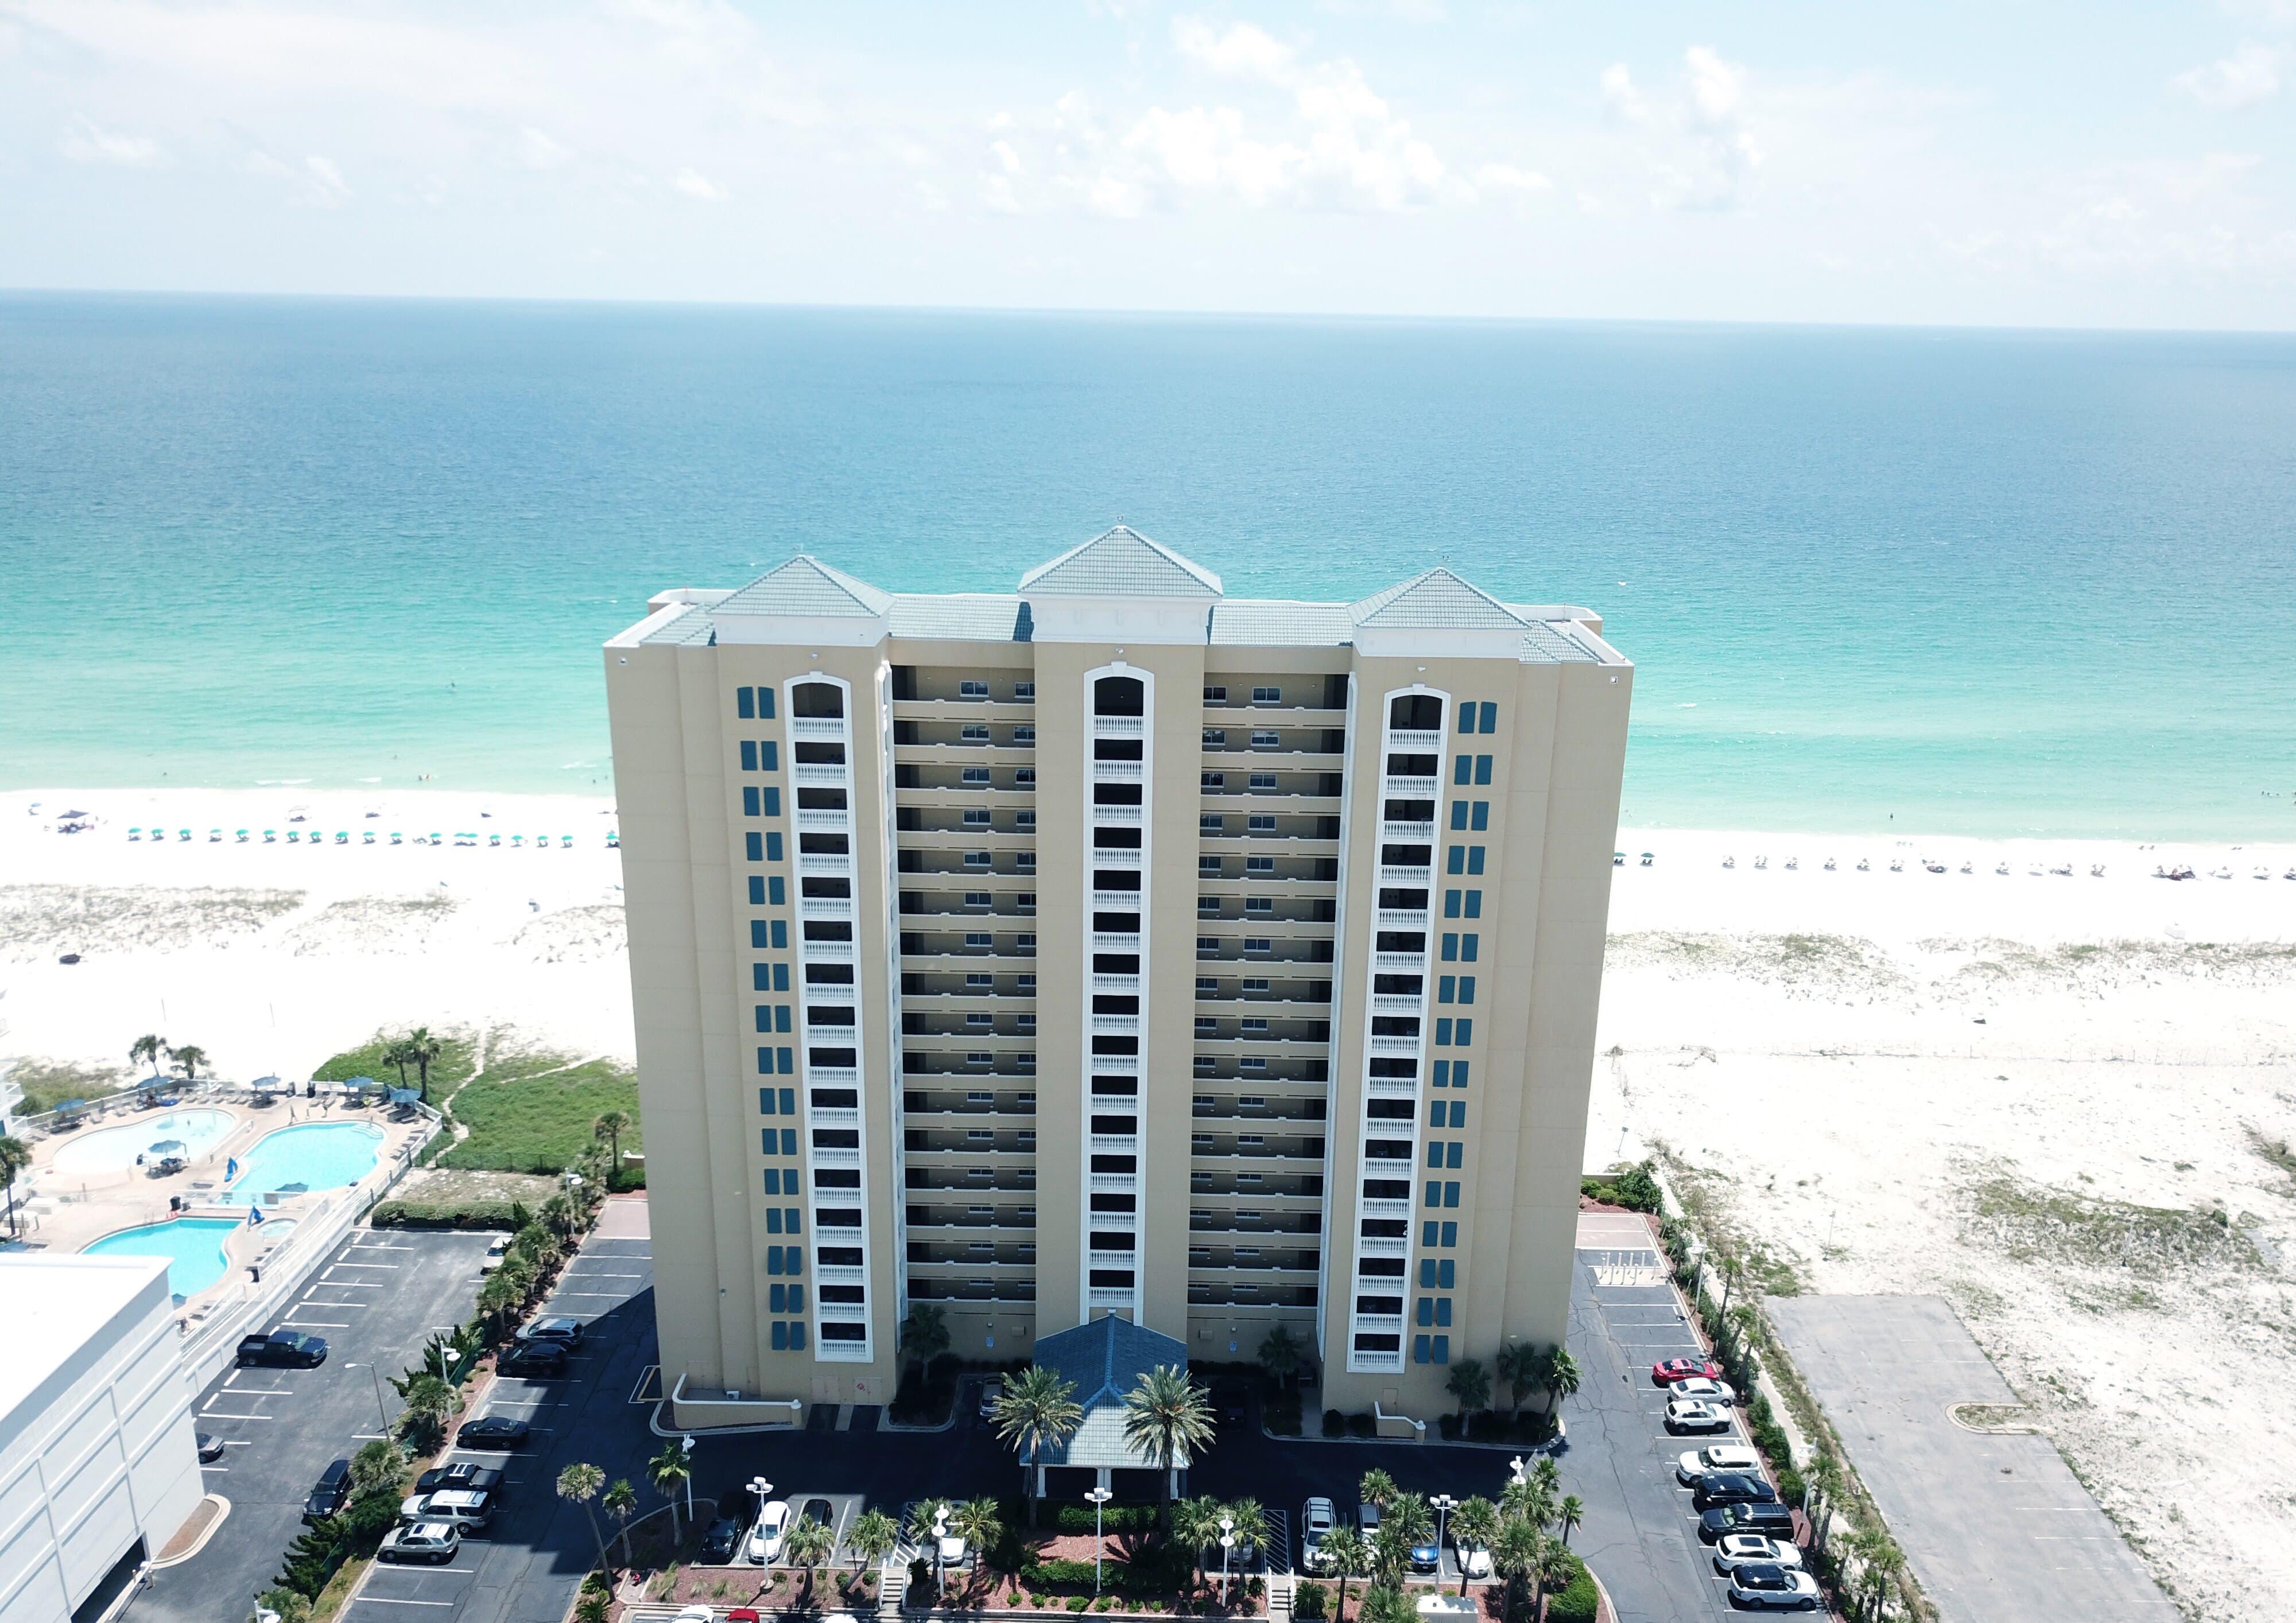 Emerald Isle #1205 Condo rental in Emerald Isle Pensacola Beach in Pensacola Beach Florida - #32